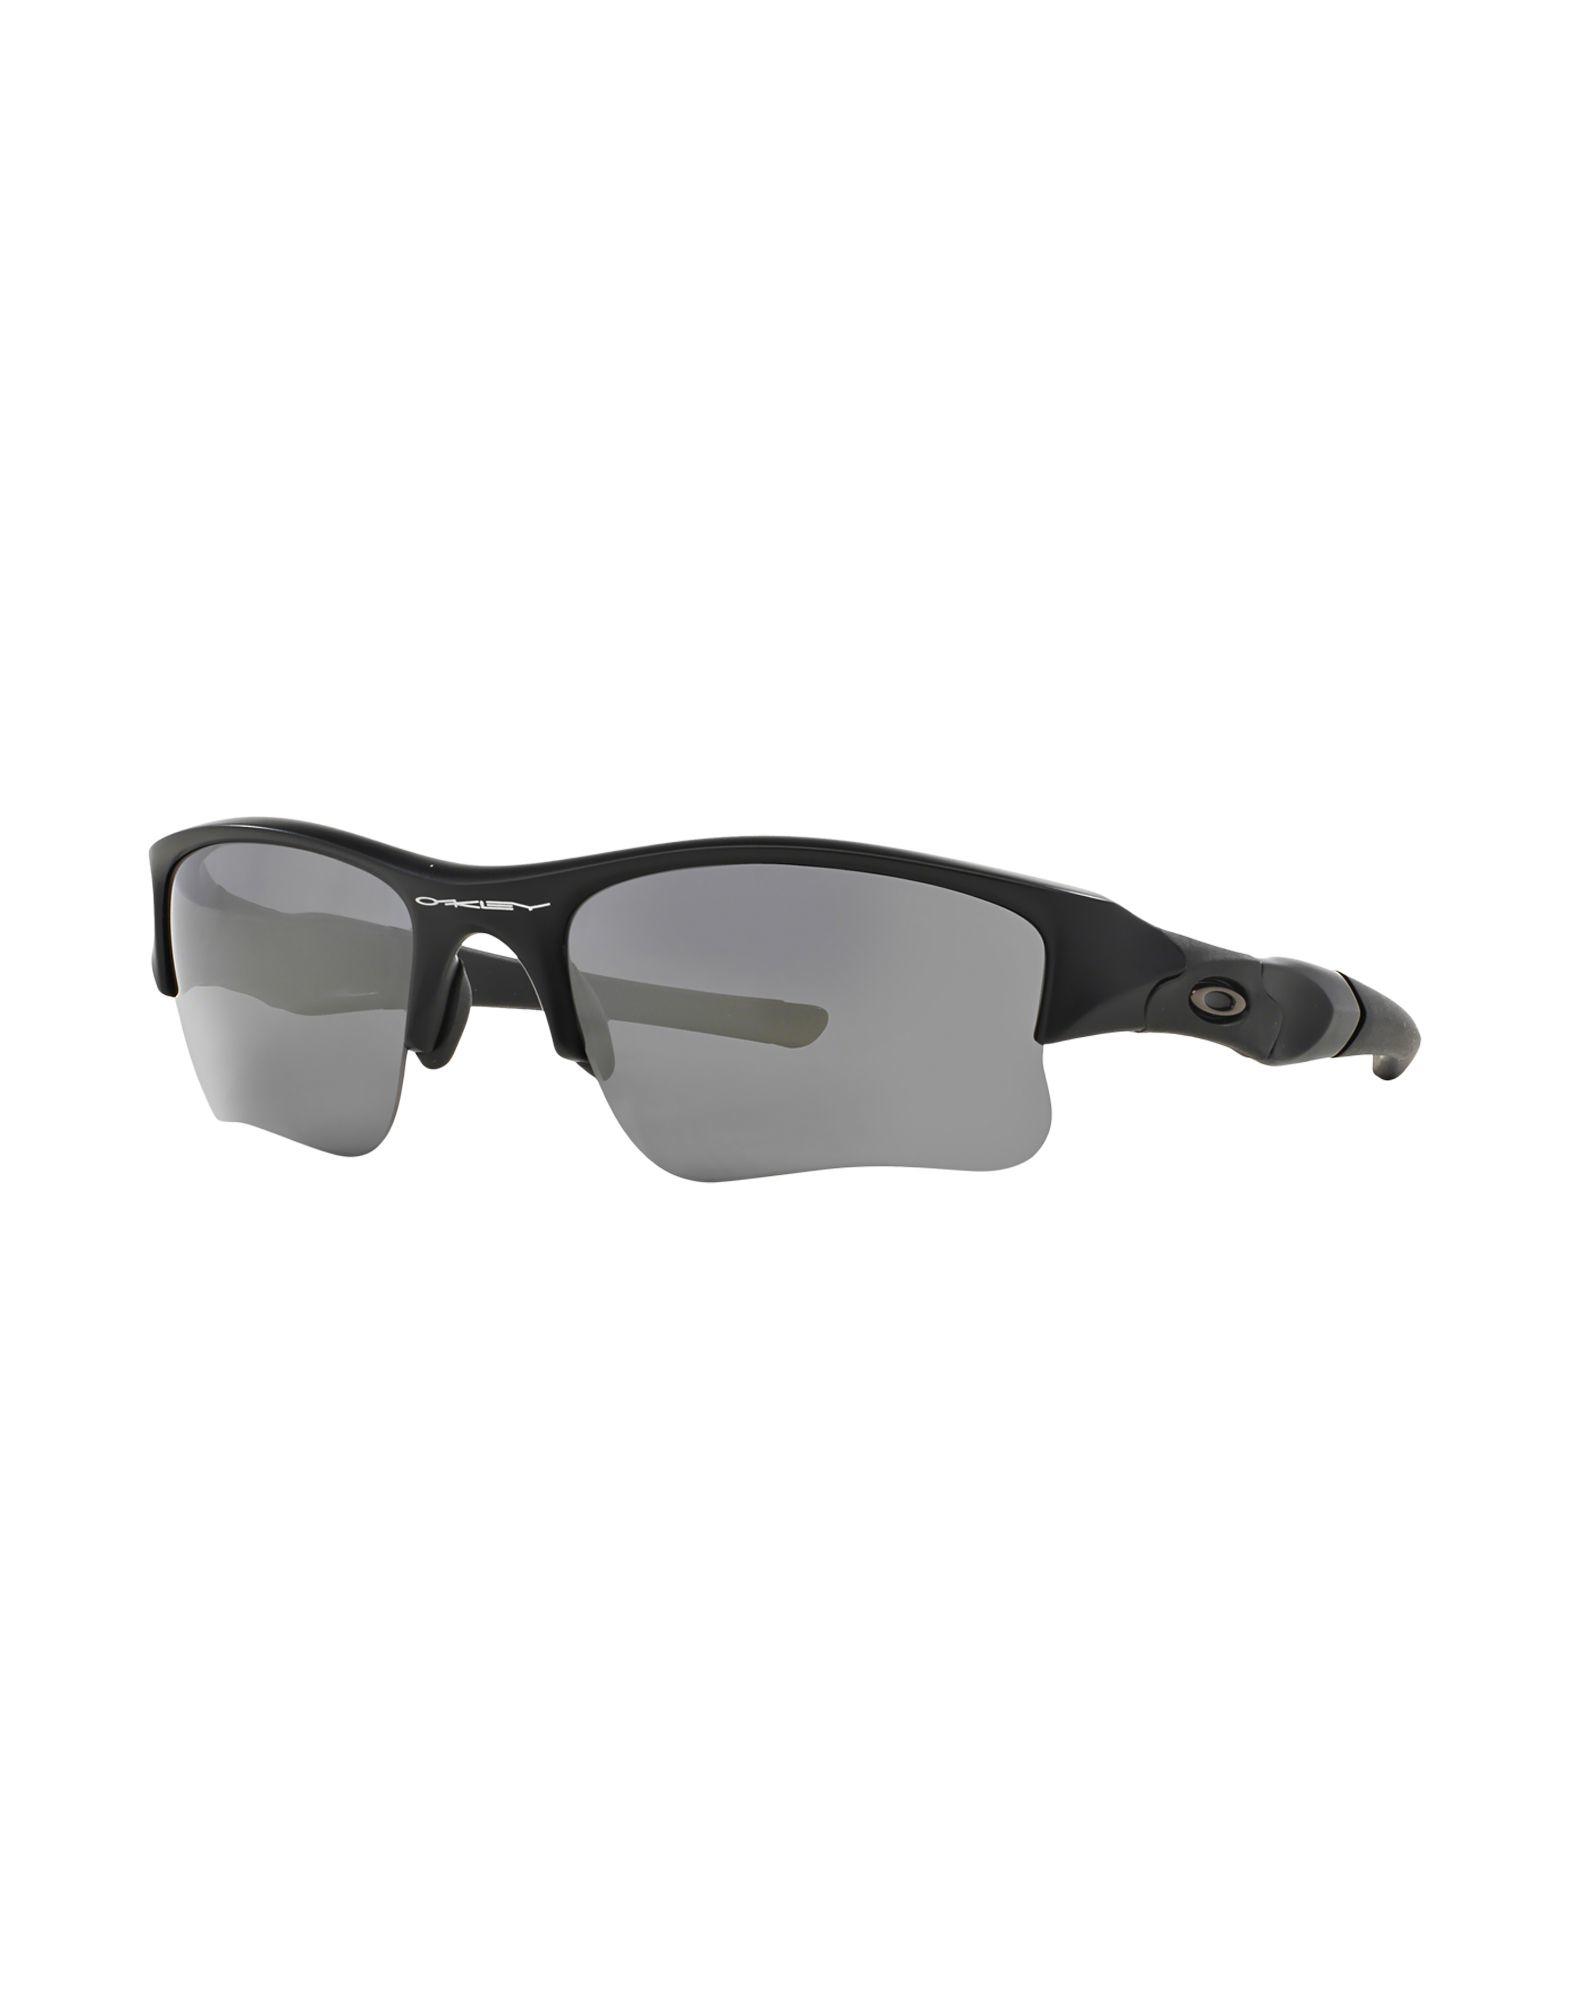 sunglasses for men oakley sunglasses